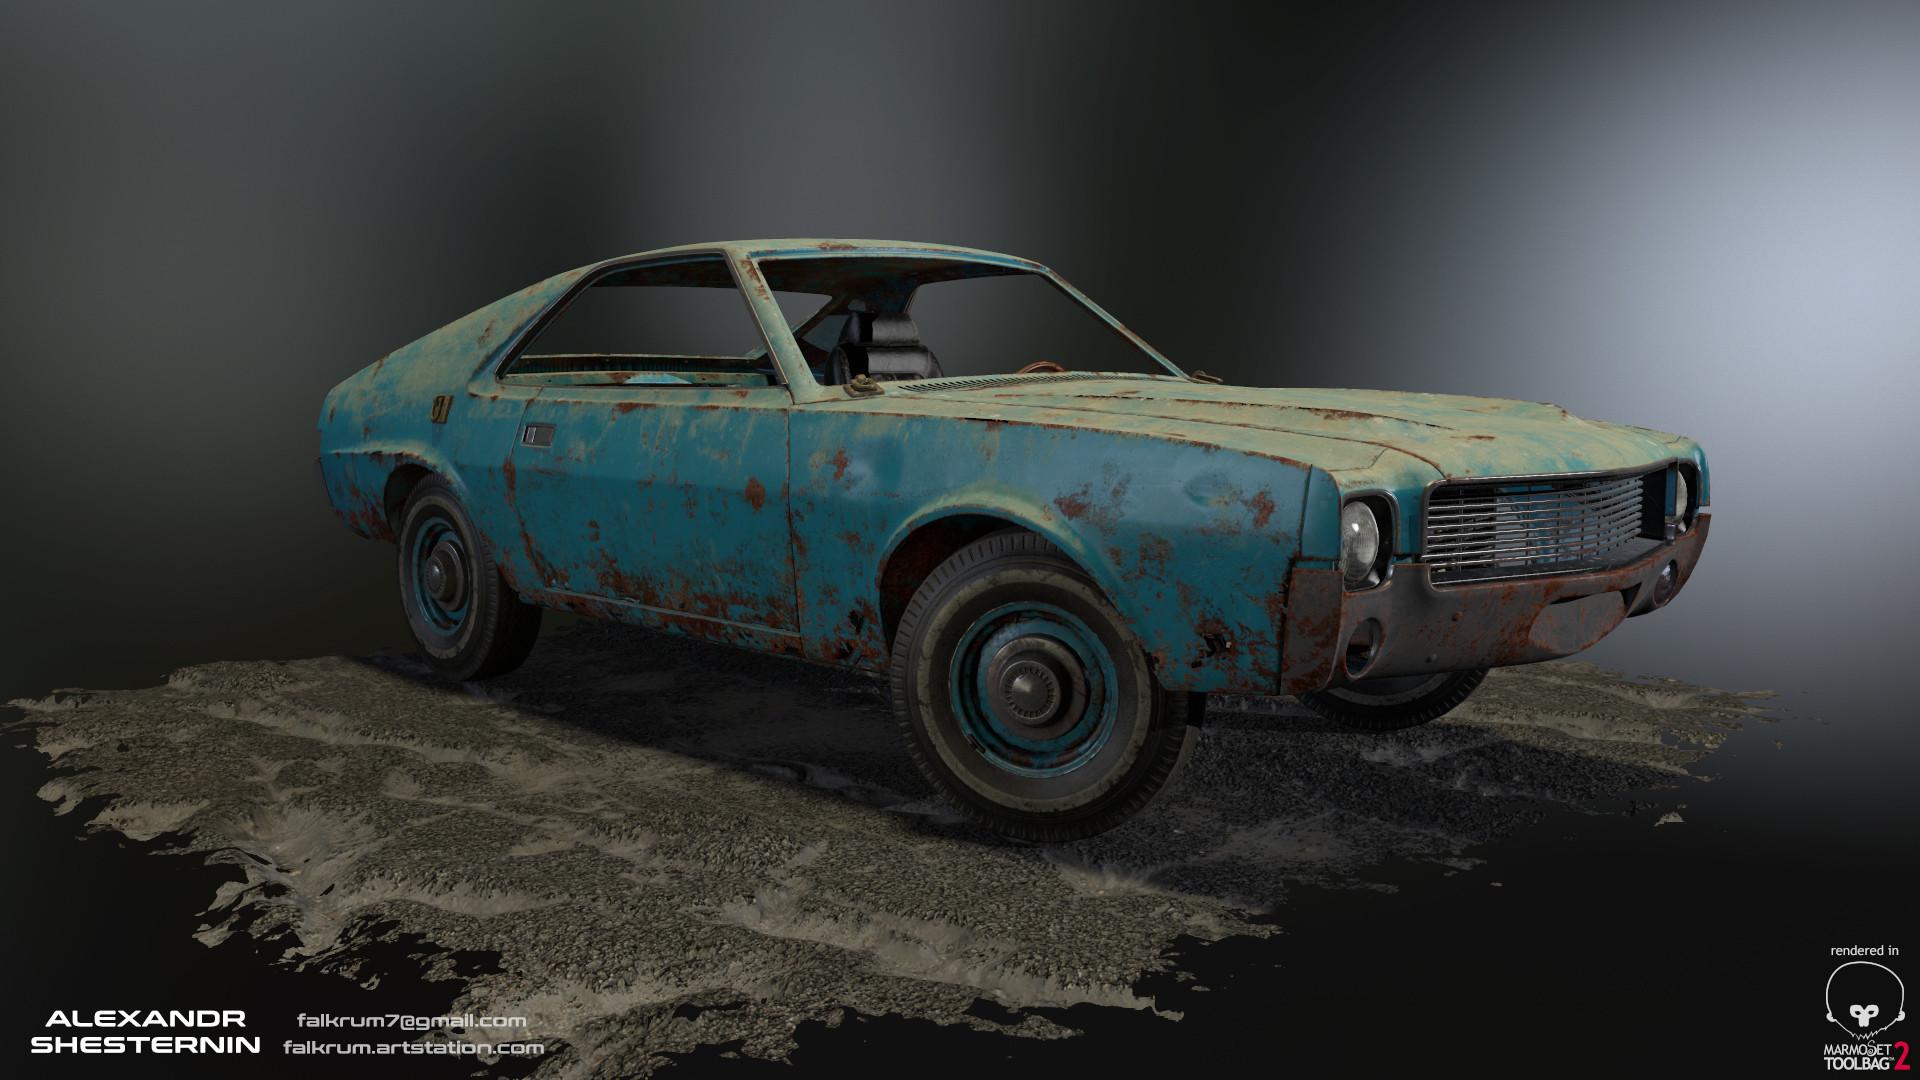 Alexandr shesternin modular abandoned car02